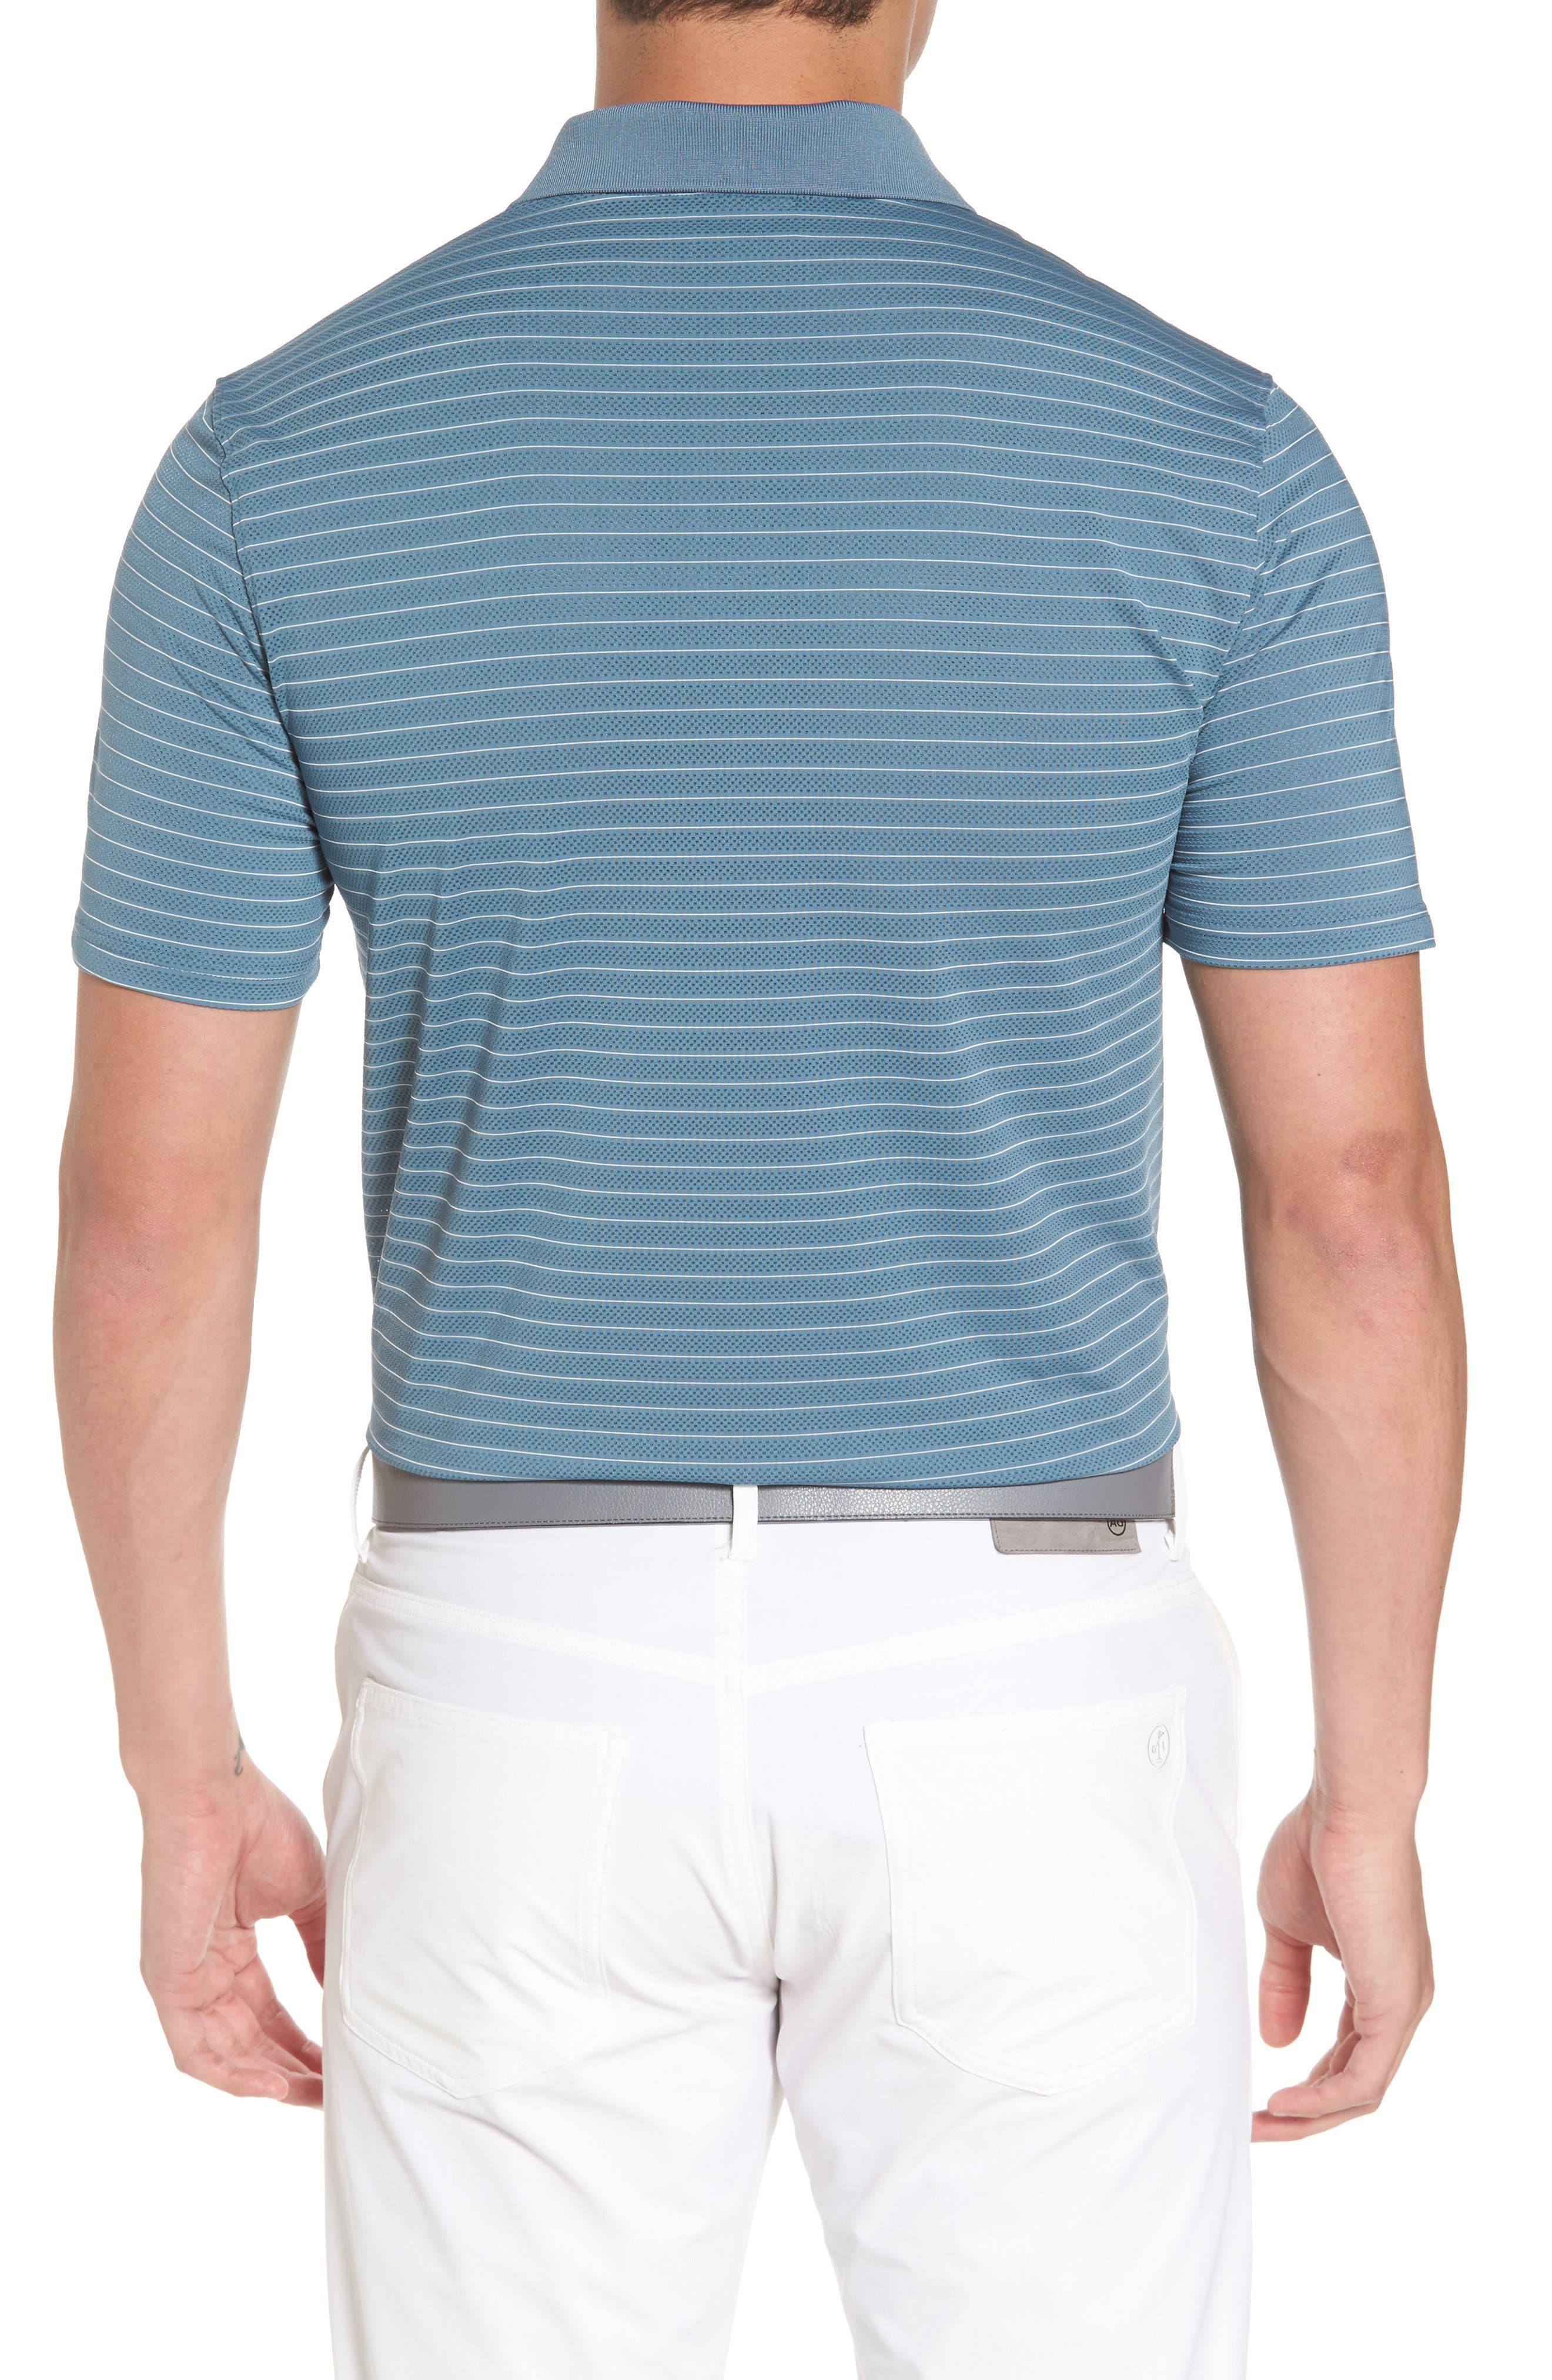 Trexler Stripe Polo,                             Alternate thumbnail 2, color,                             Blue Print